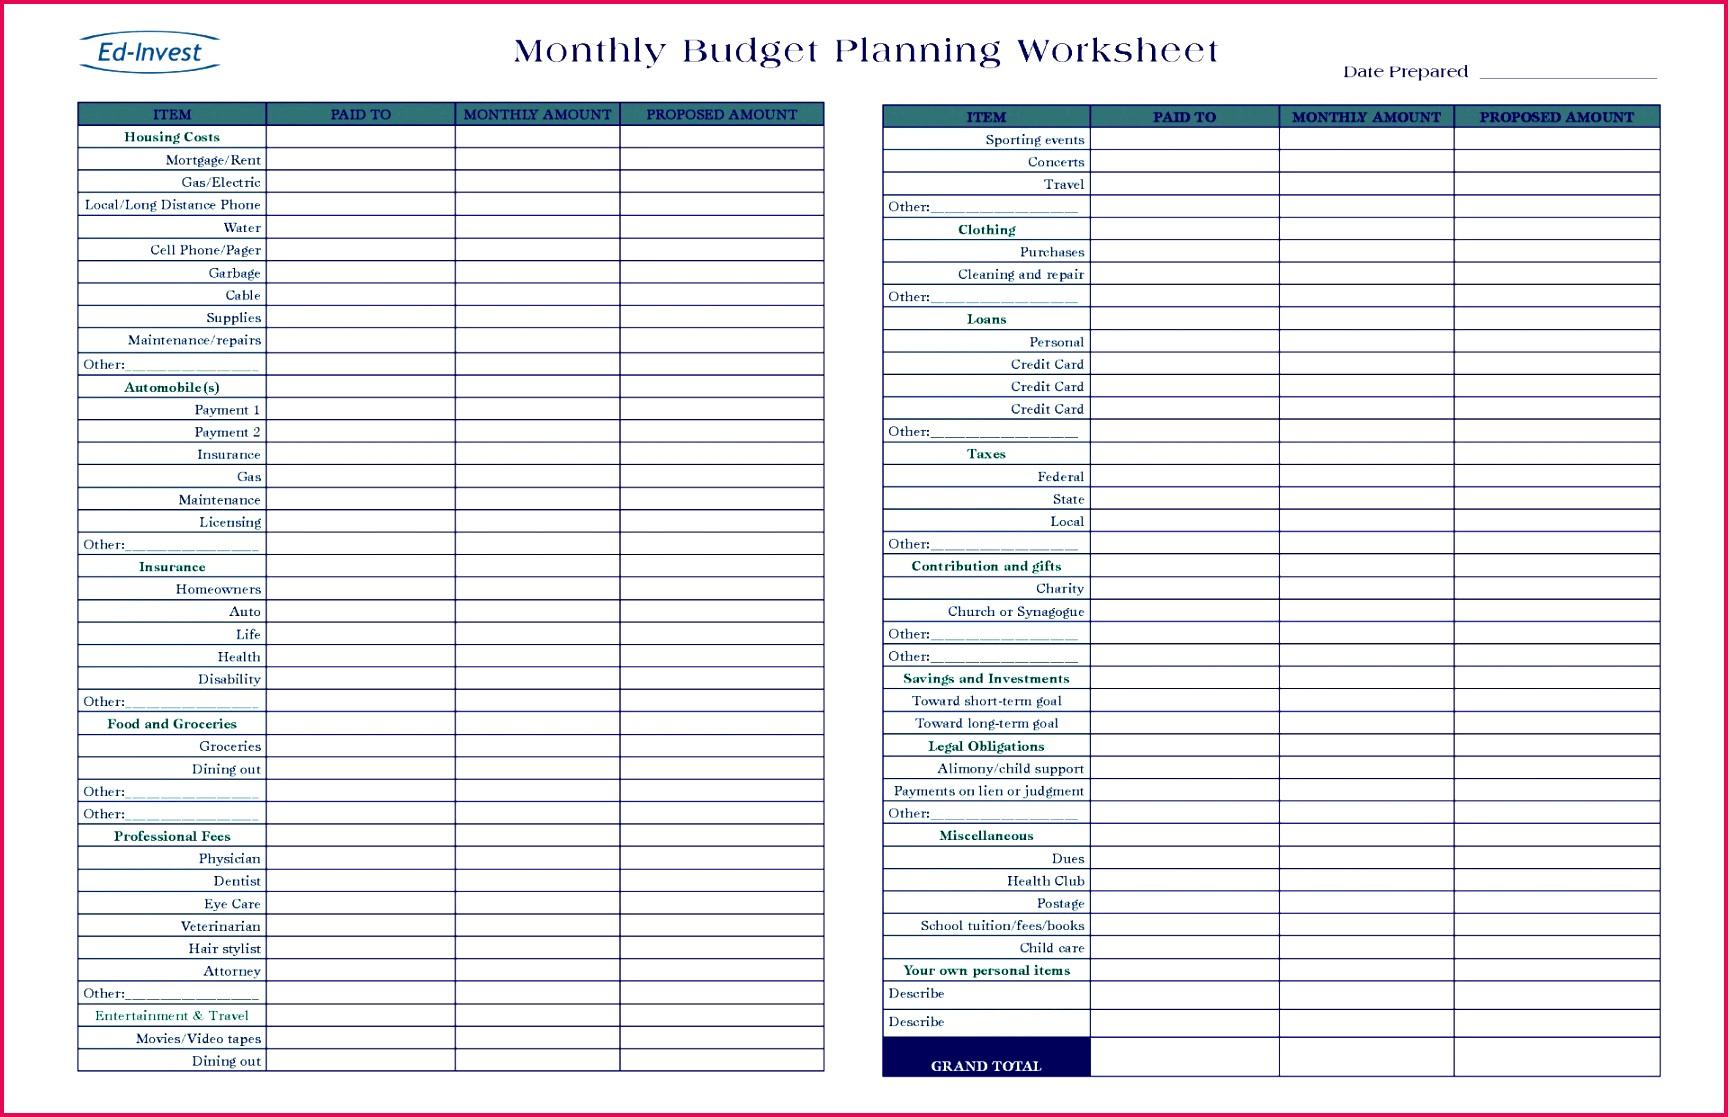 Business plan financials template excel elegant luxury startup financial plan documents ideas documents ideas 1920x1242